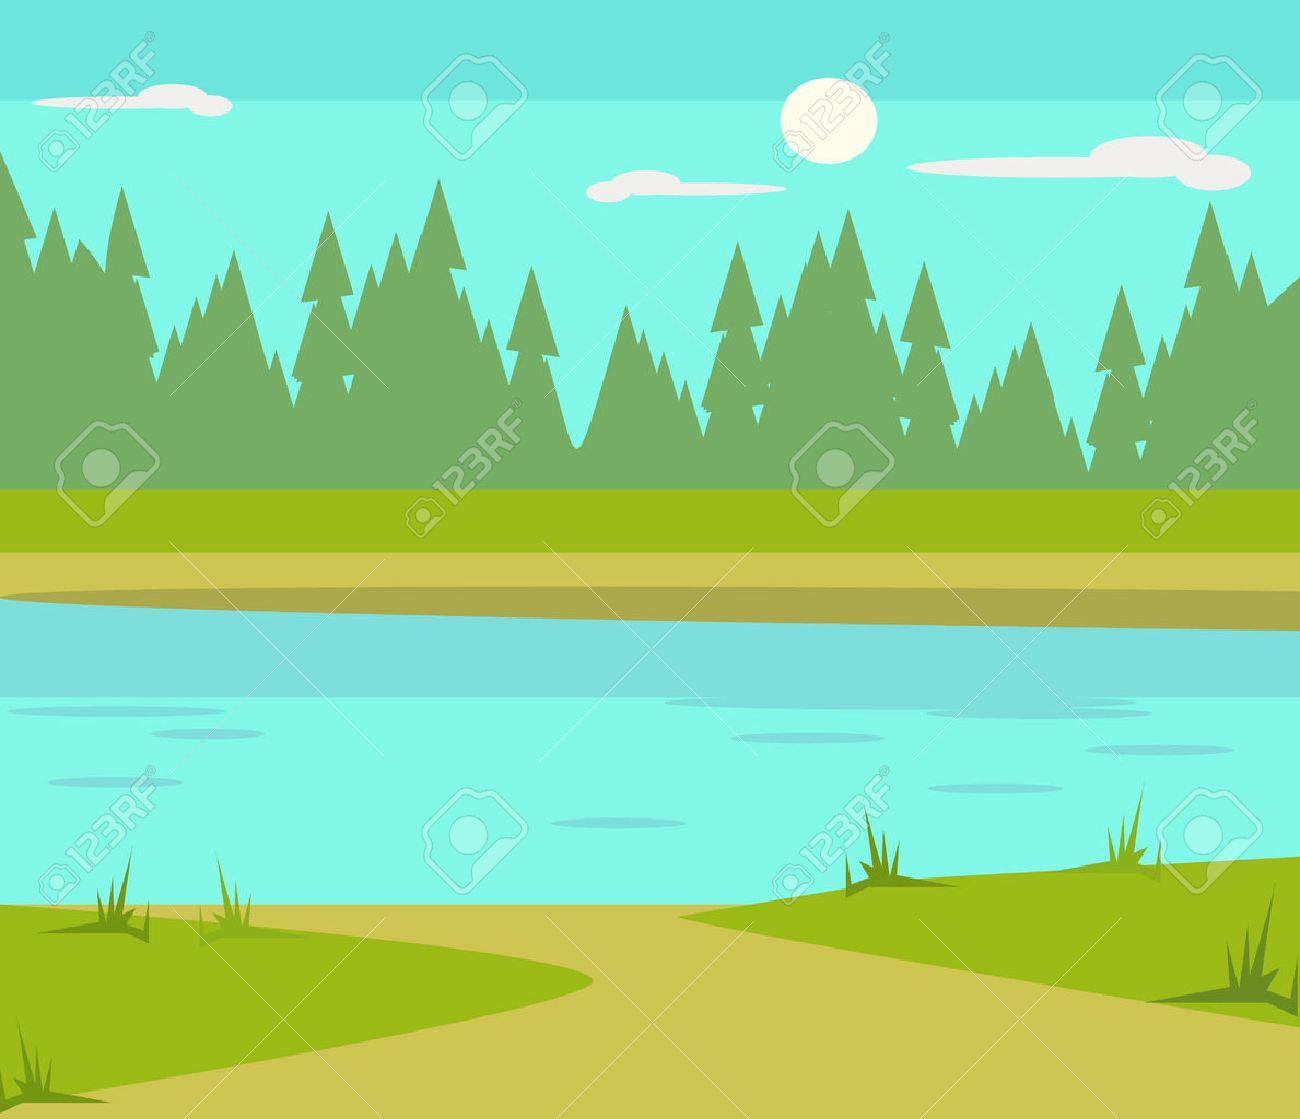 Lake flat cartoon illustration - 56975120